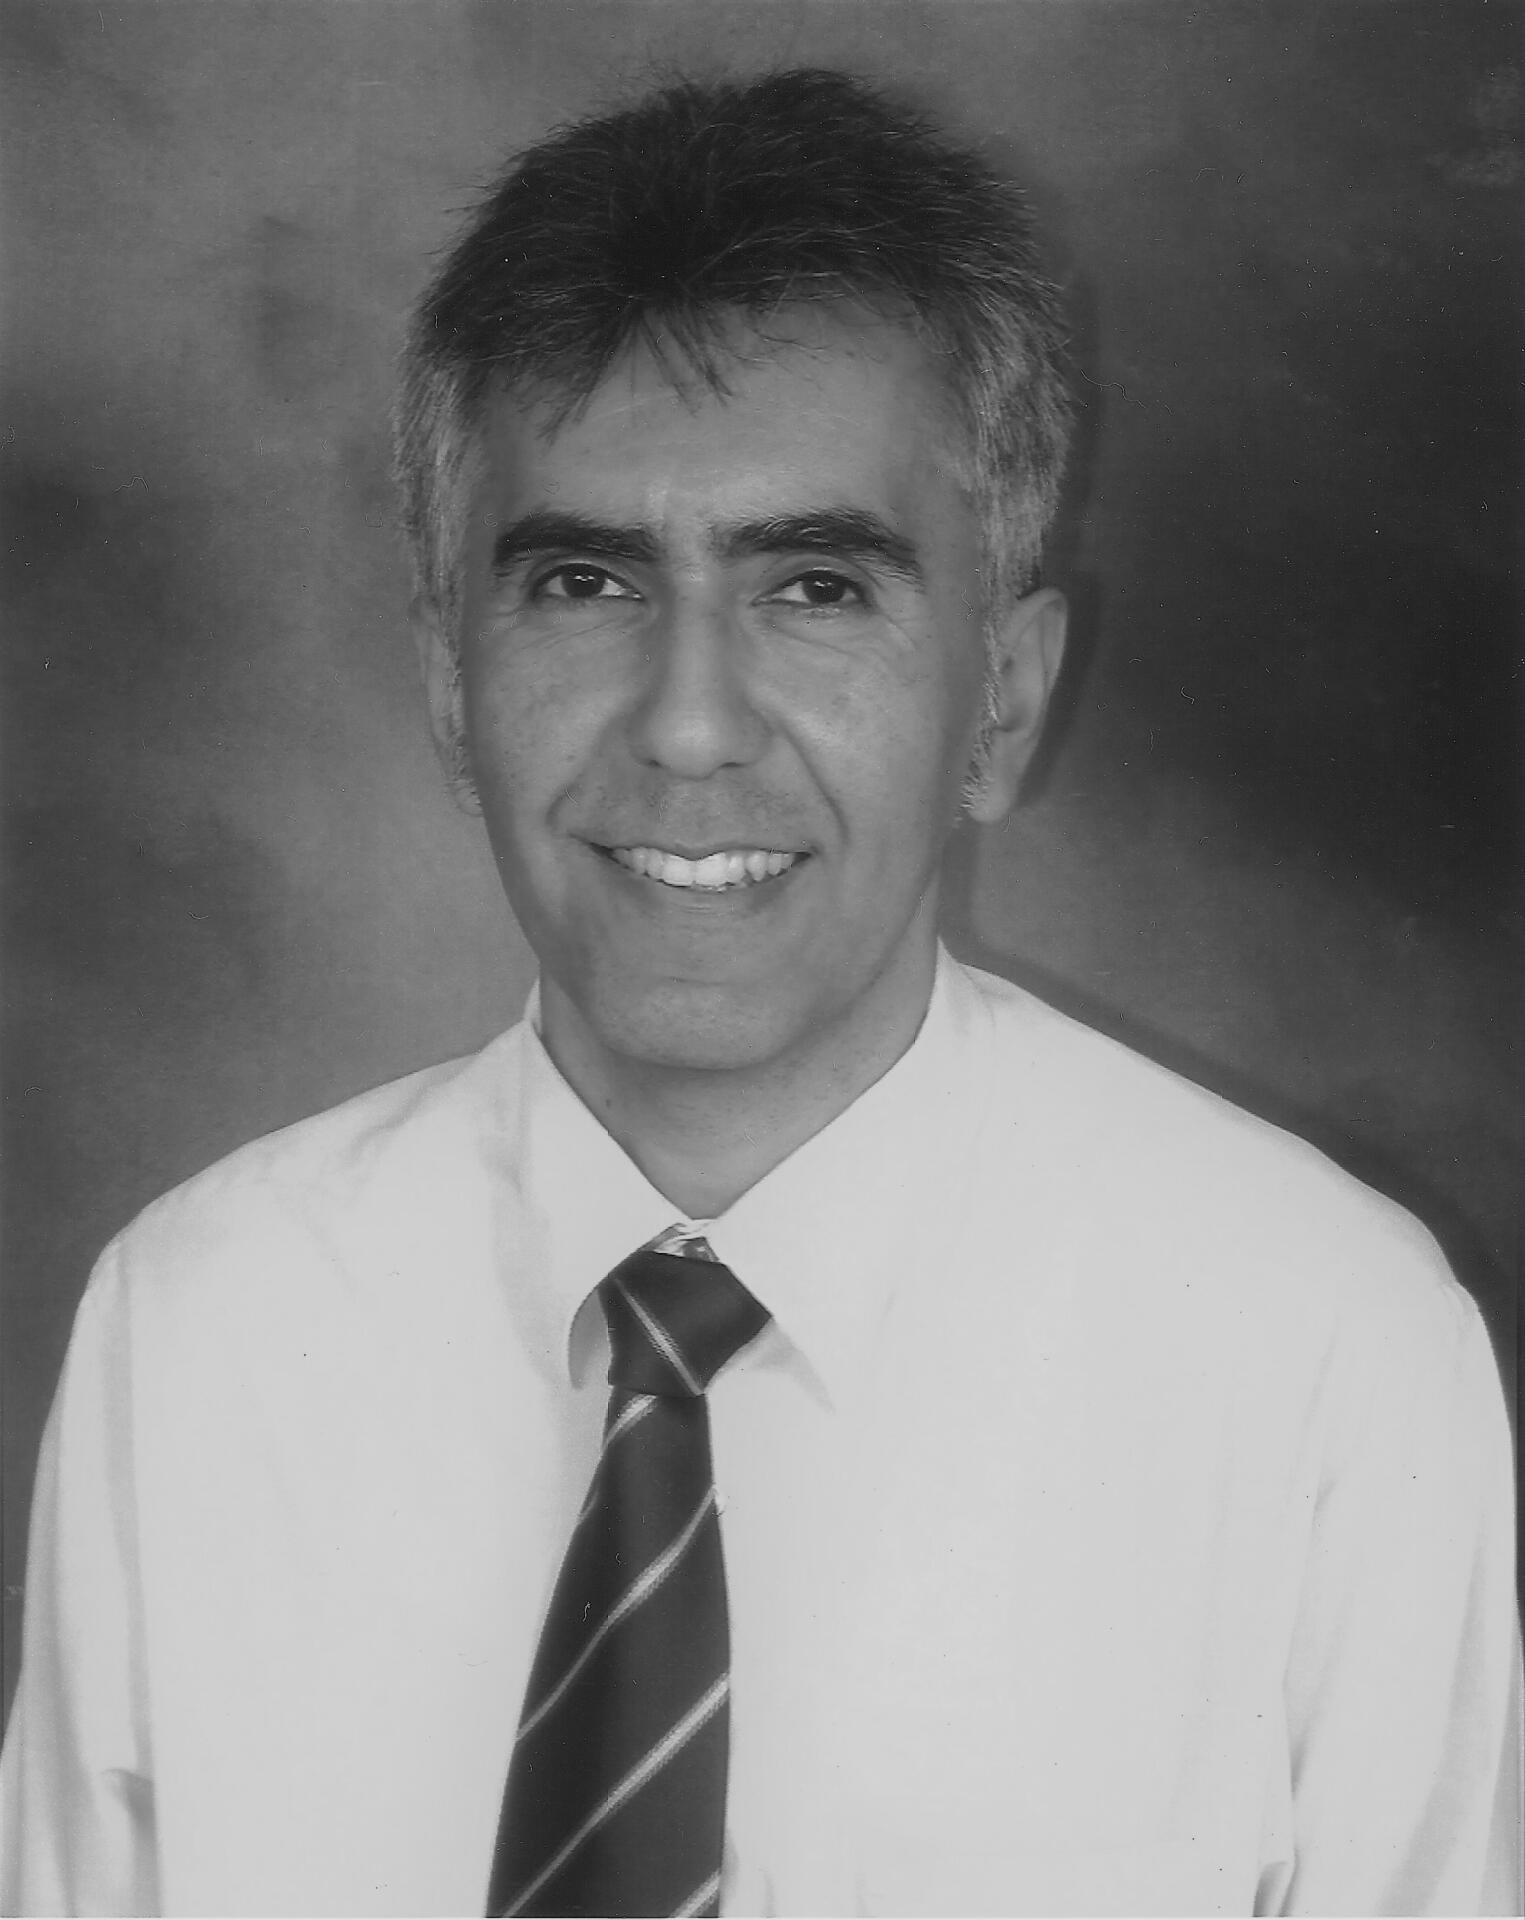 Miguel Cavero Velaochaga